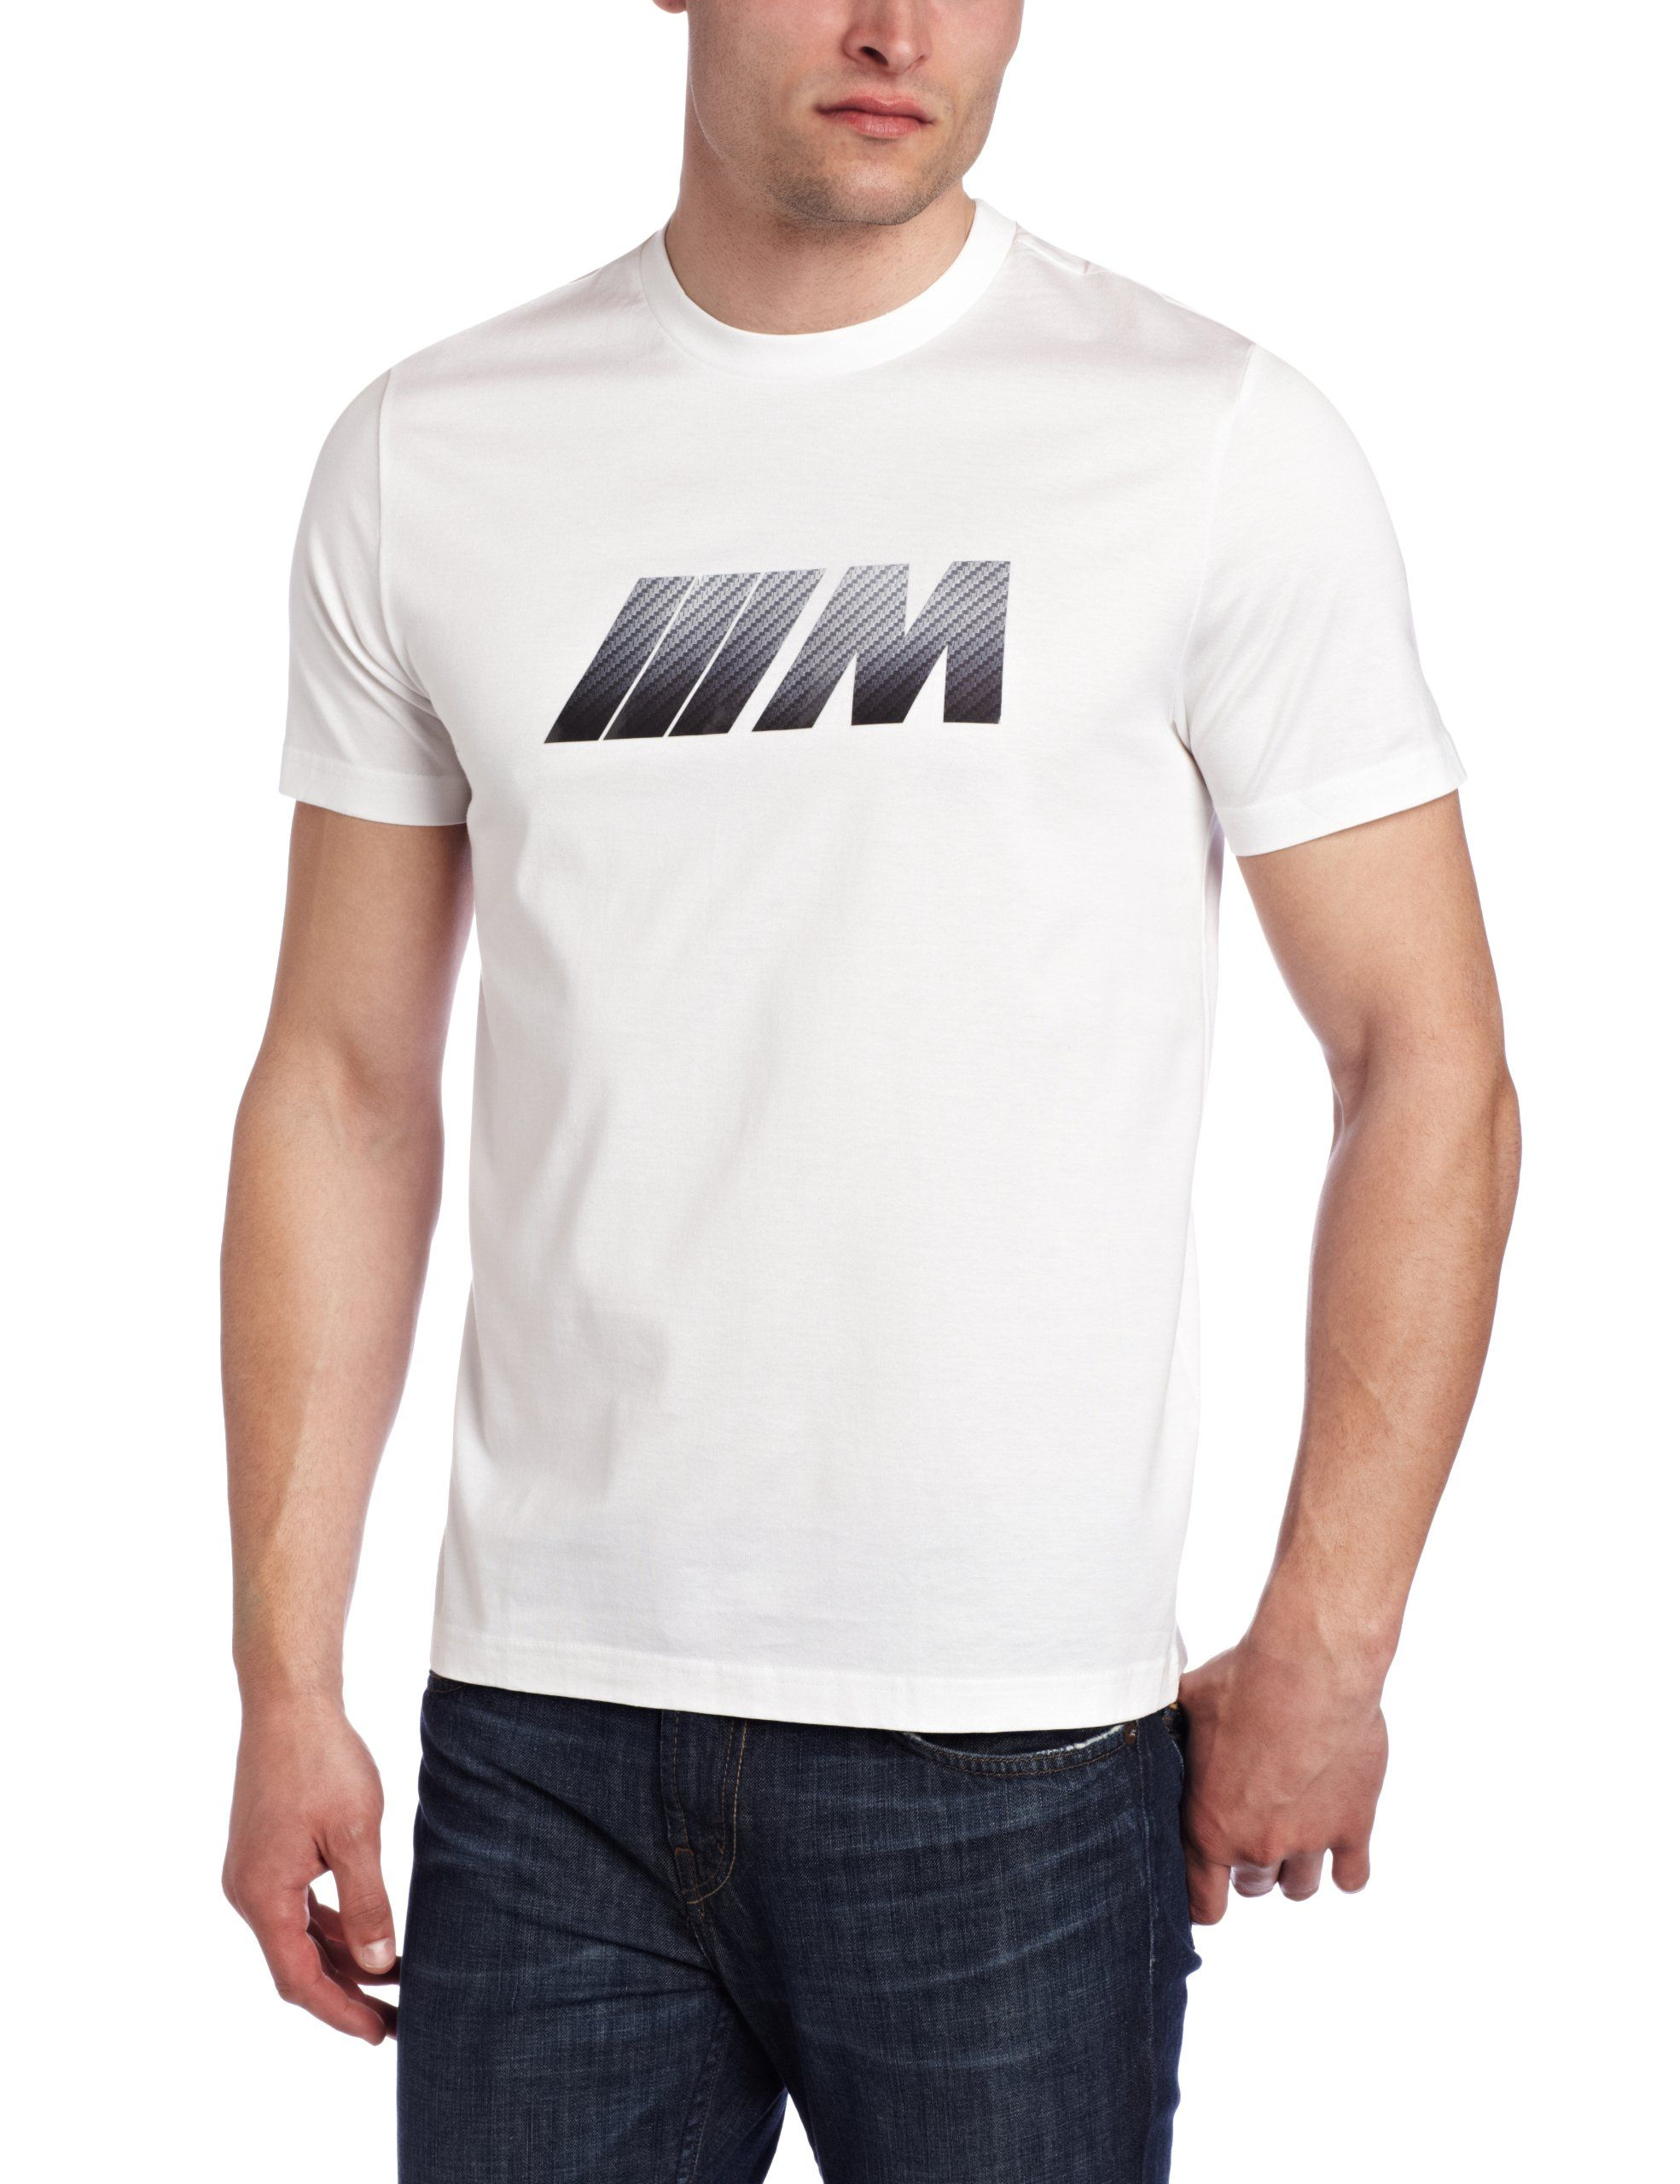 alpha cart record front benz second ams first world mercedes performance dynasty t shirts gtr shirt